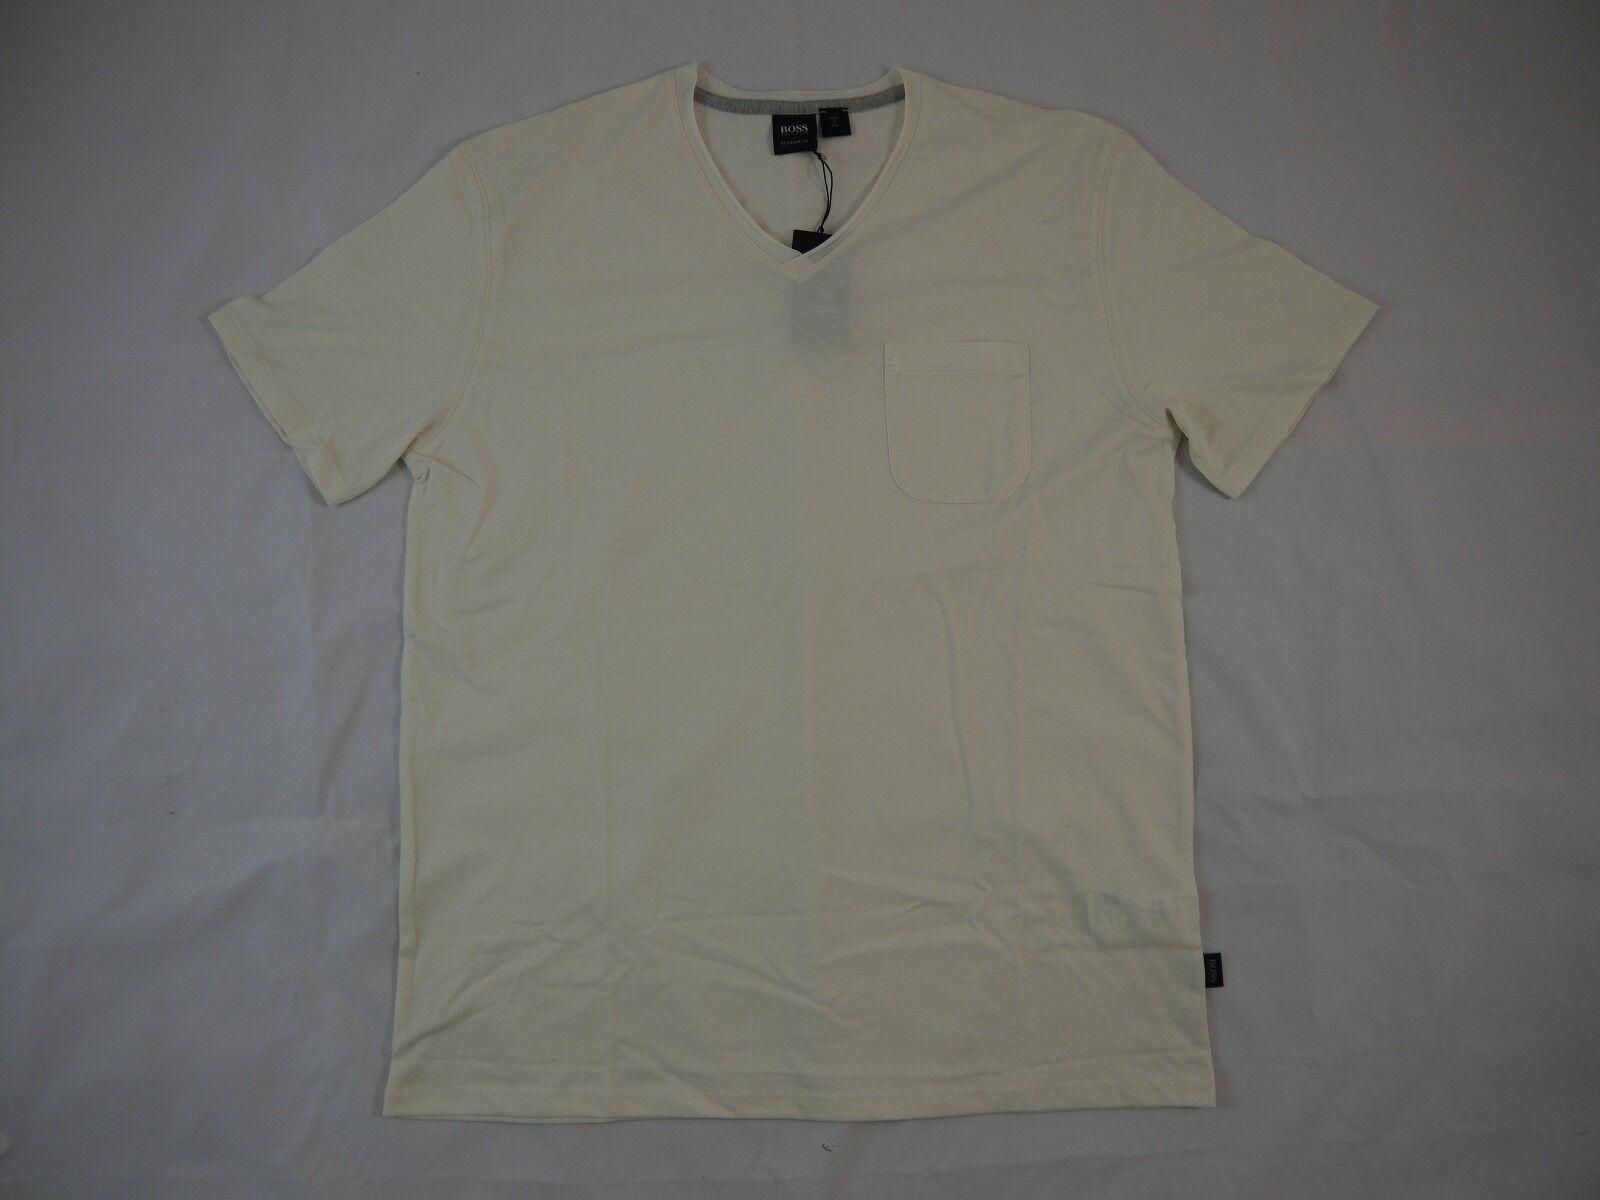 Hugo Boss GR-Canistro Beige Cotton Short Sleeve T-Shirt  XL BNWT 100% Authentic